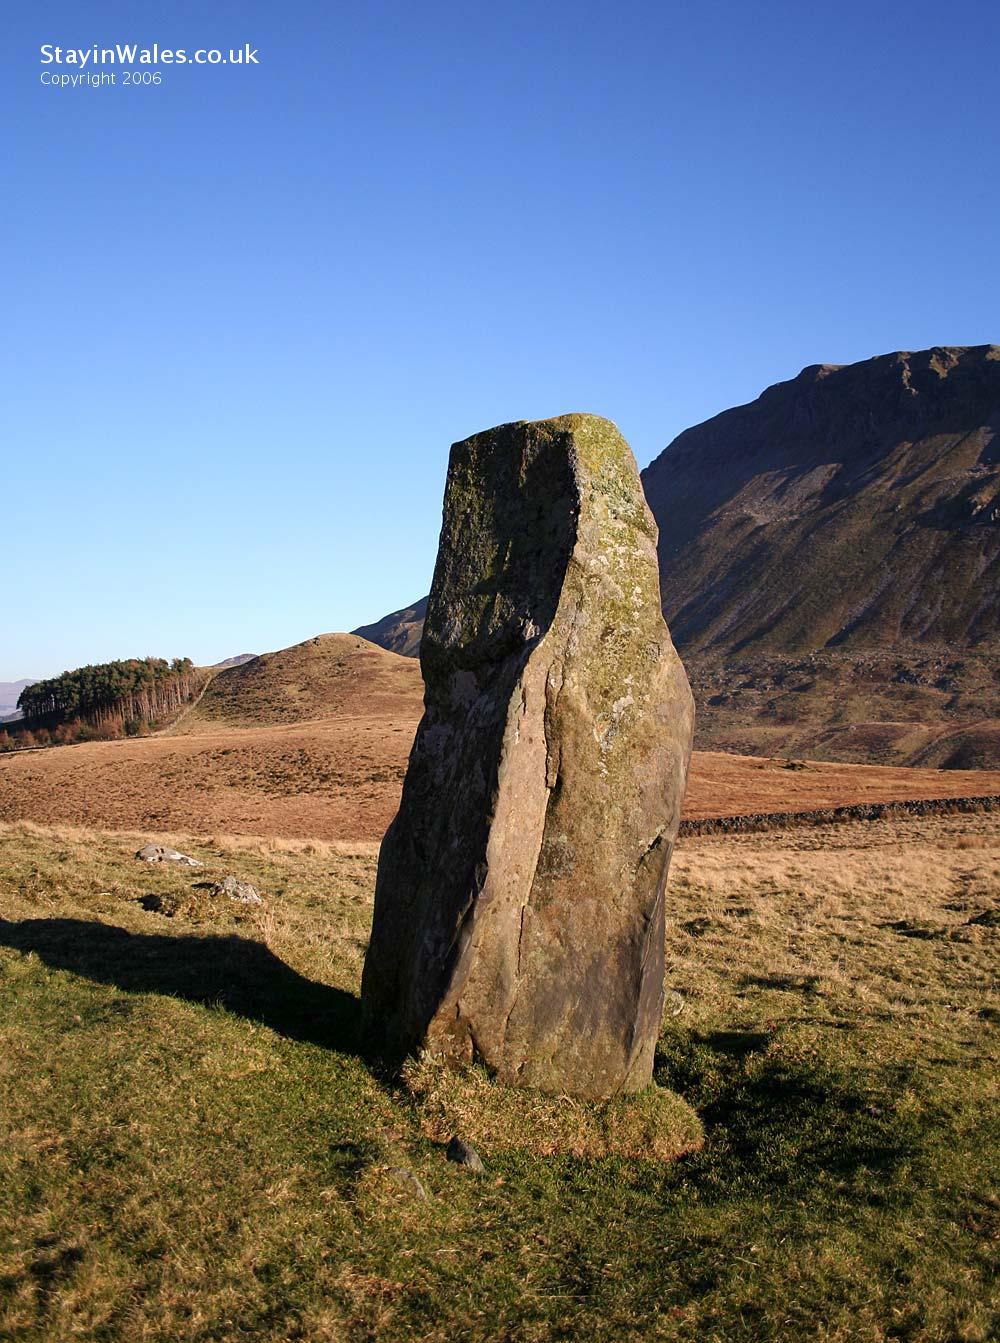 Cregennan standing stone